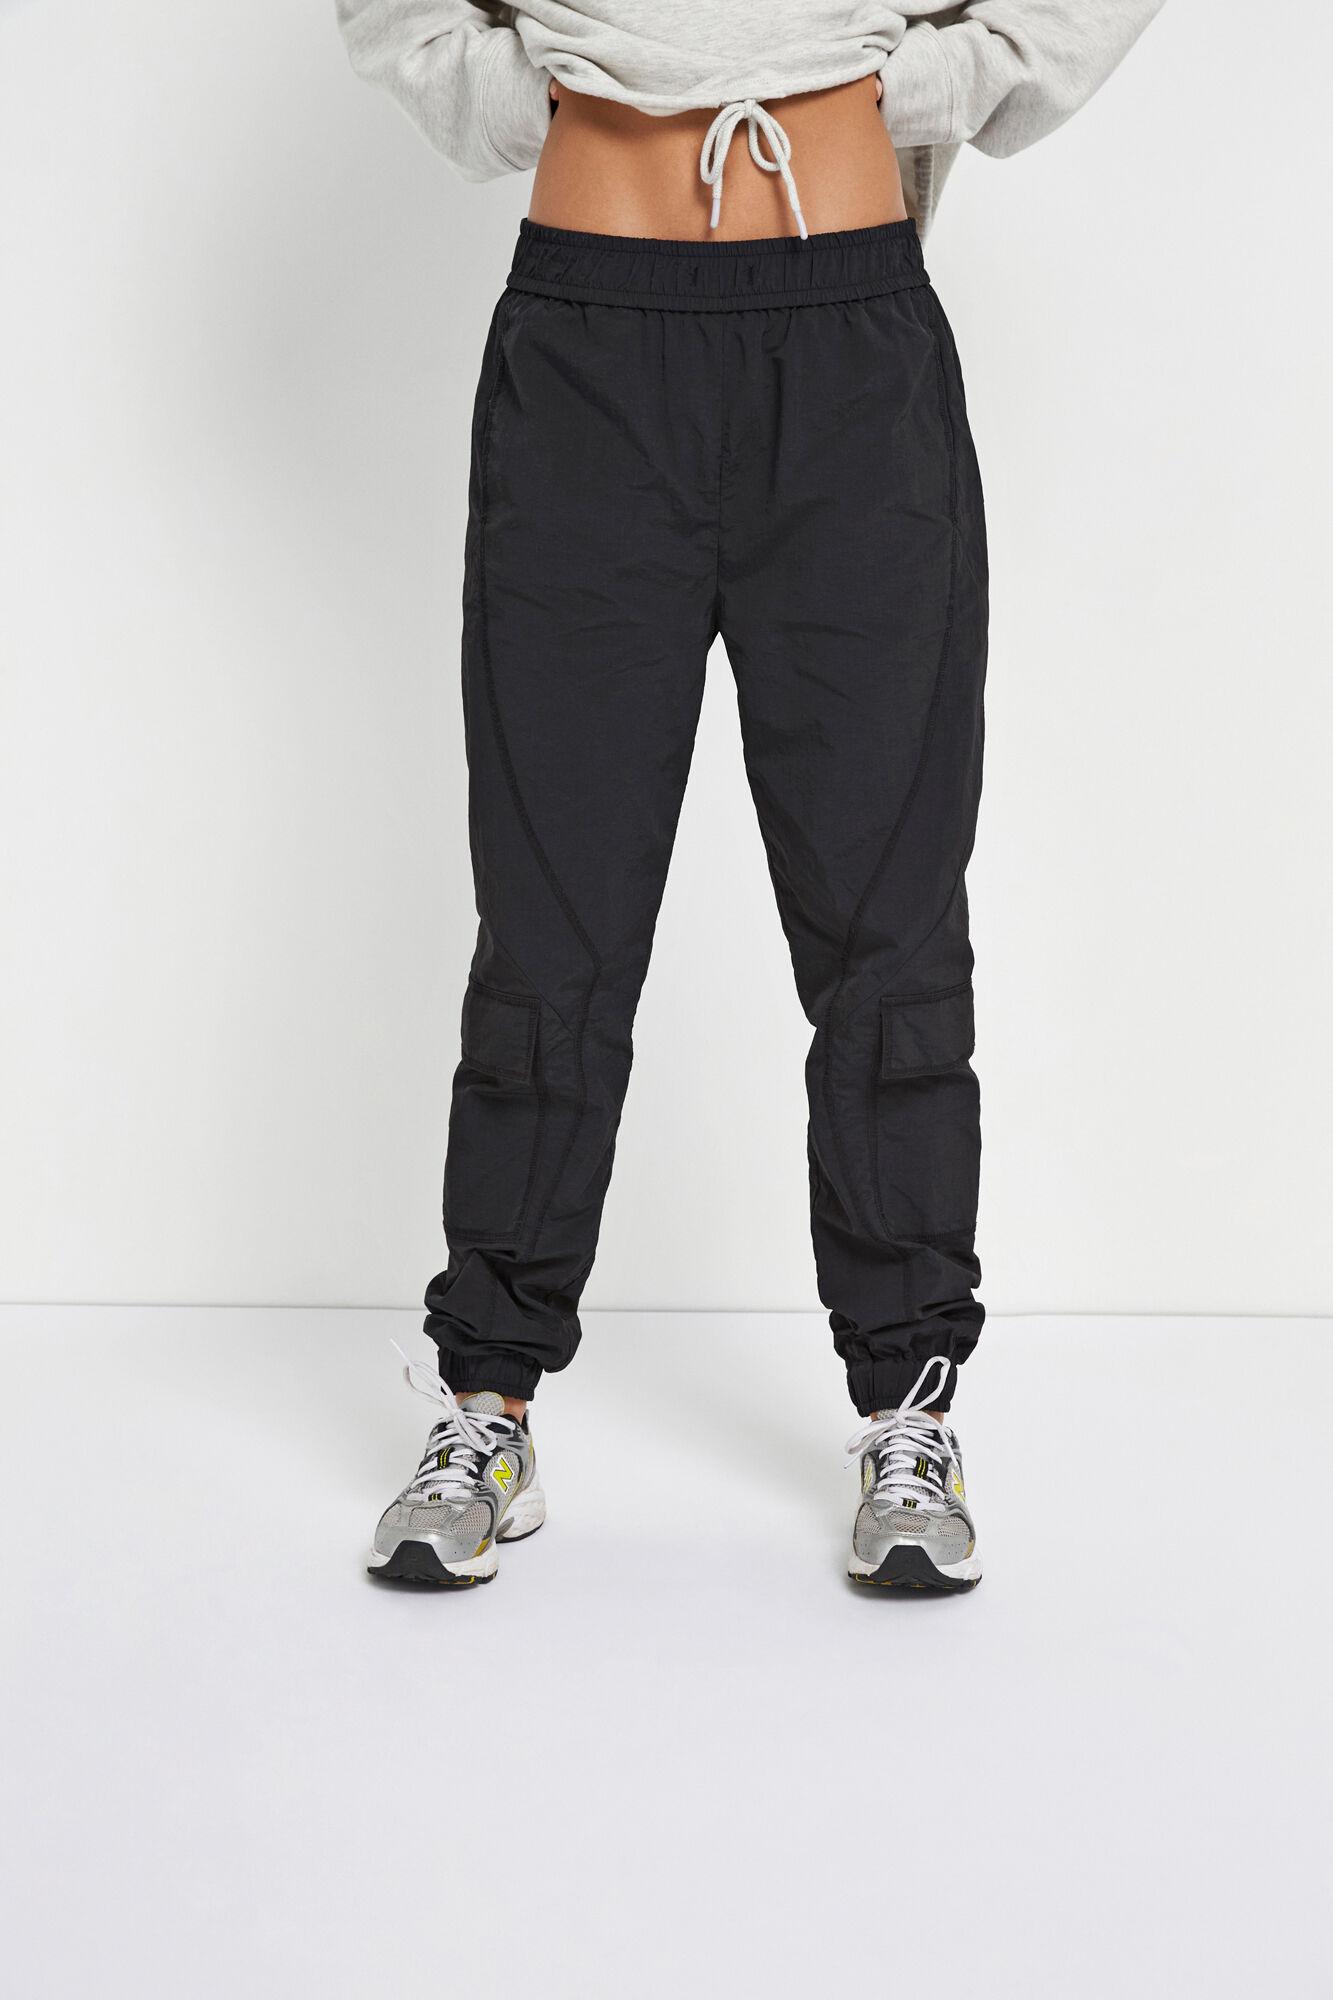 ENKAREN PANTS 6729, BLACK